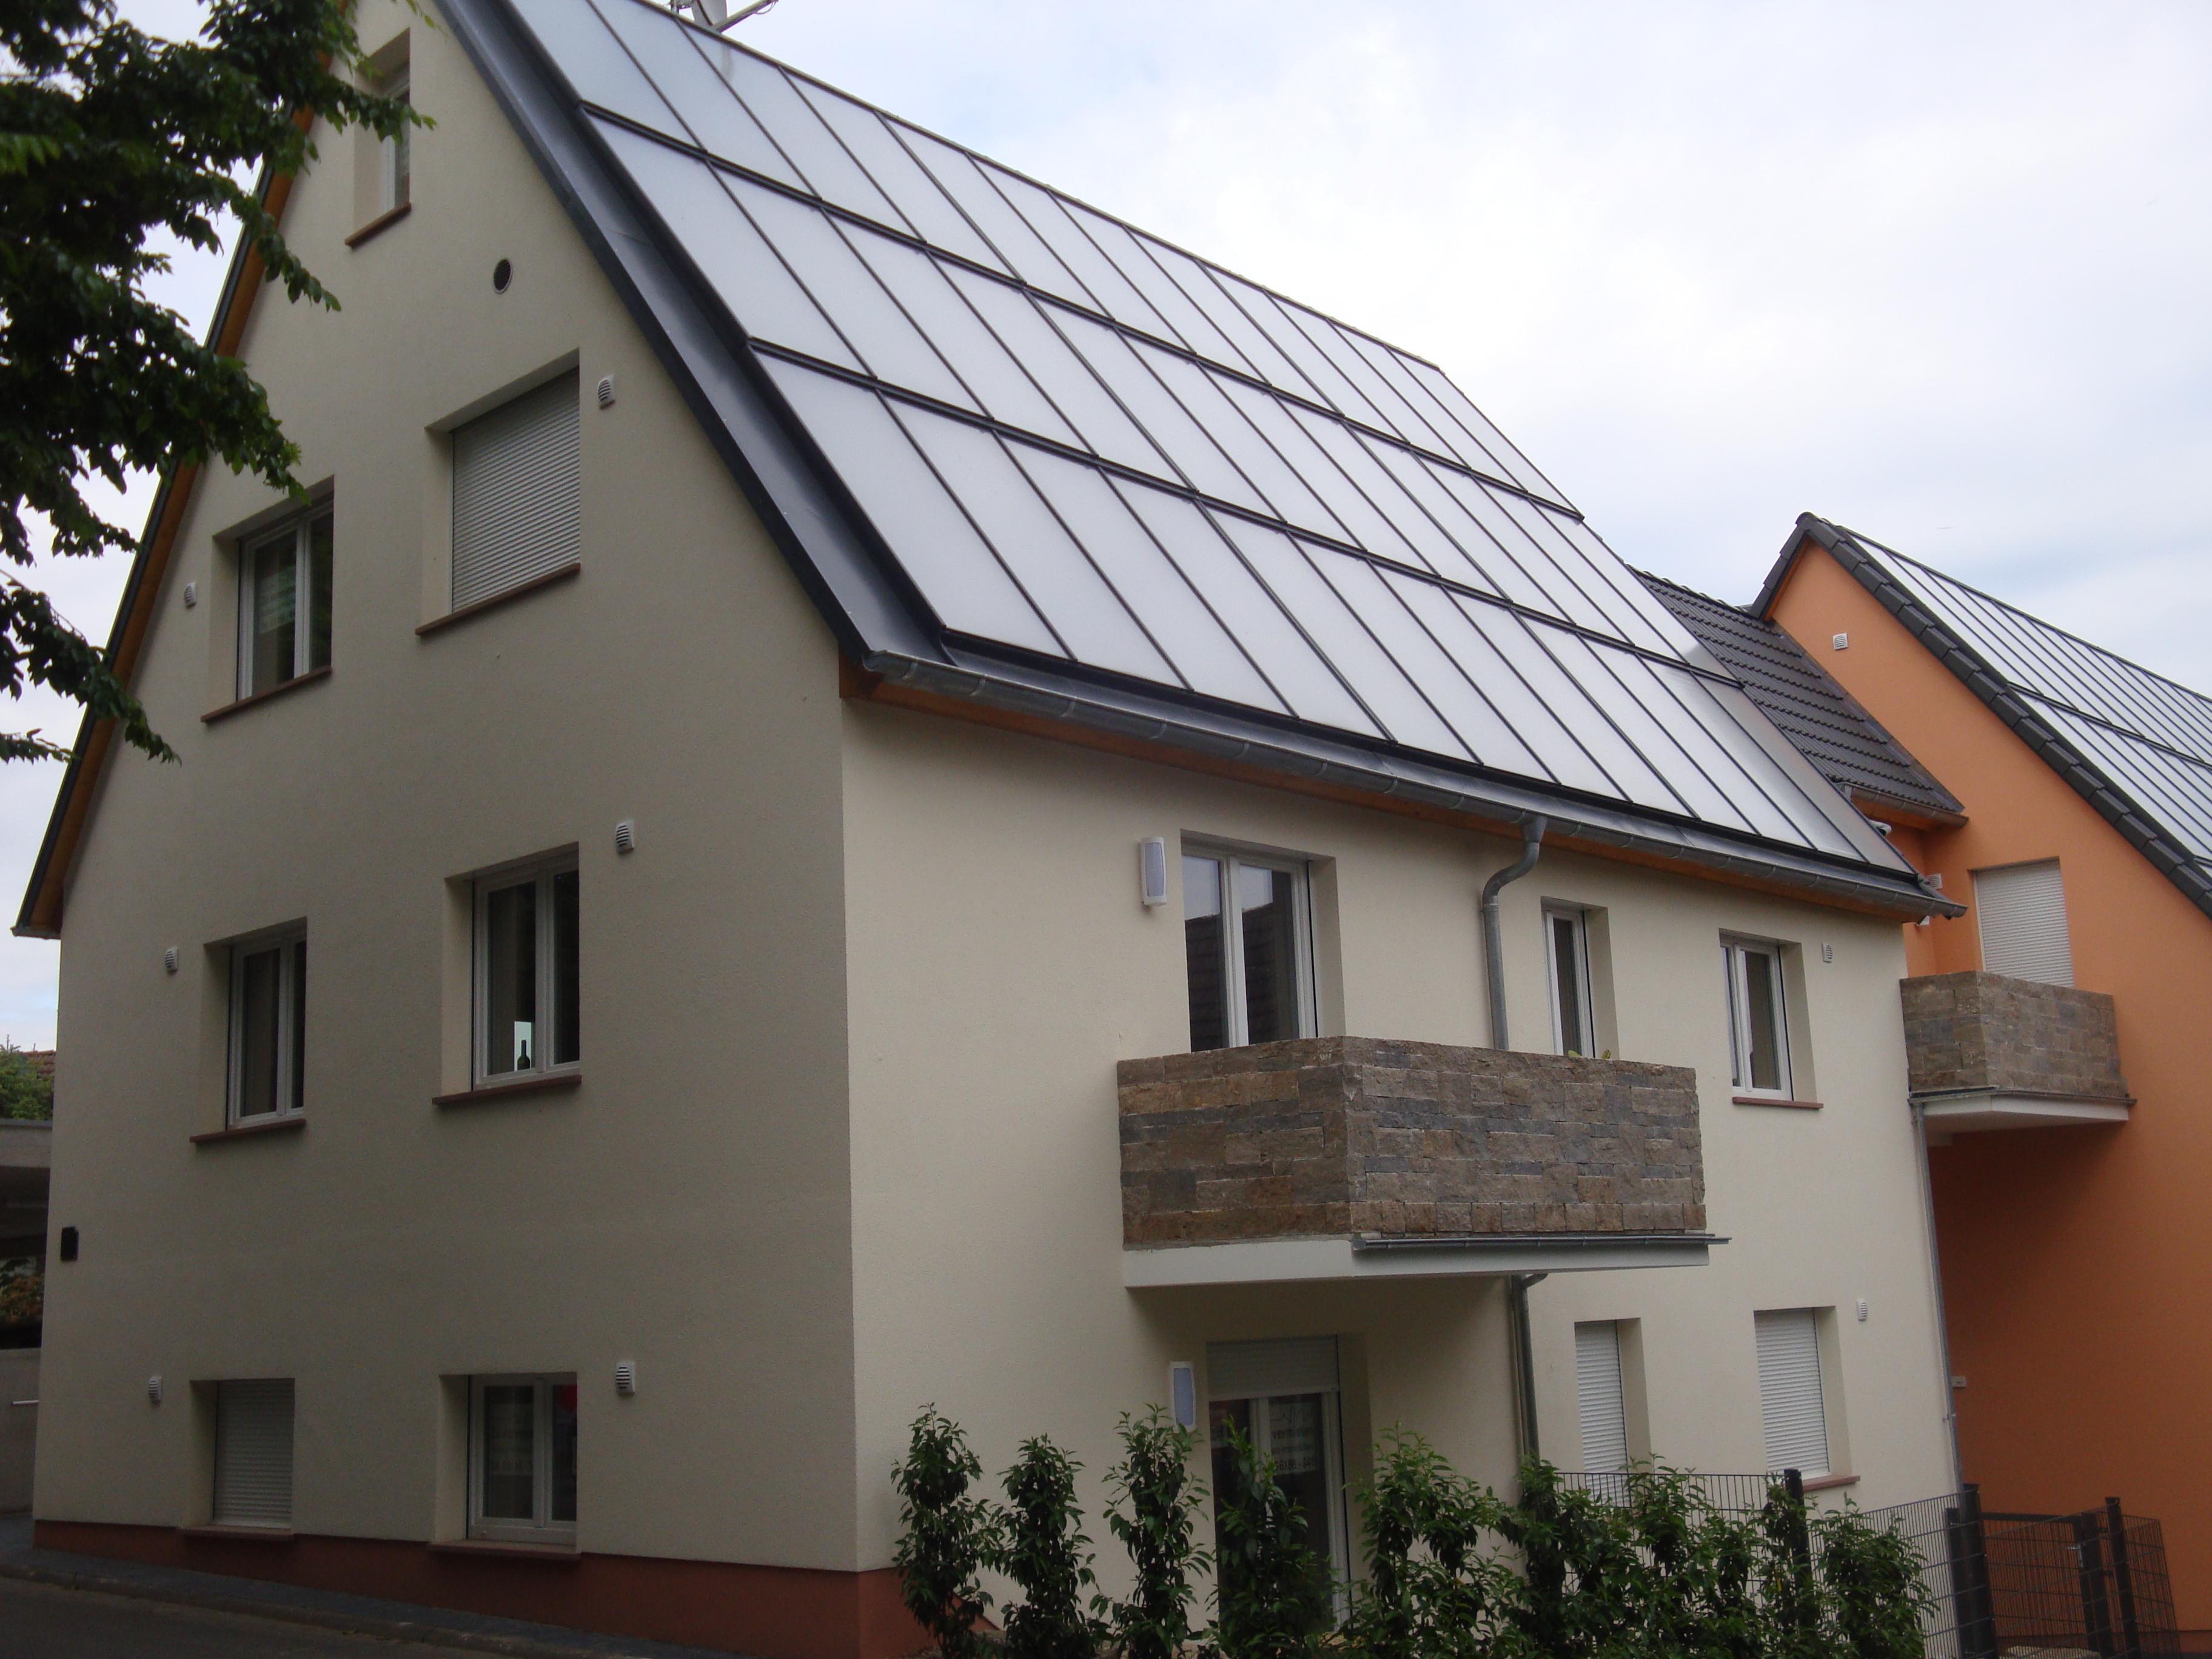 File:Solarhauskomplex 1.JPG